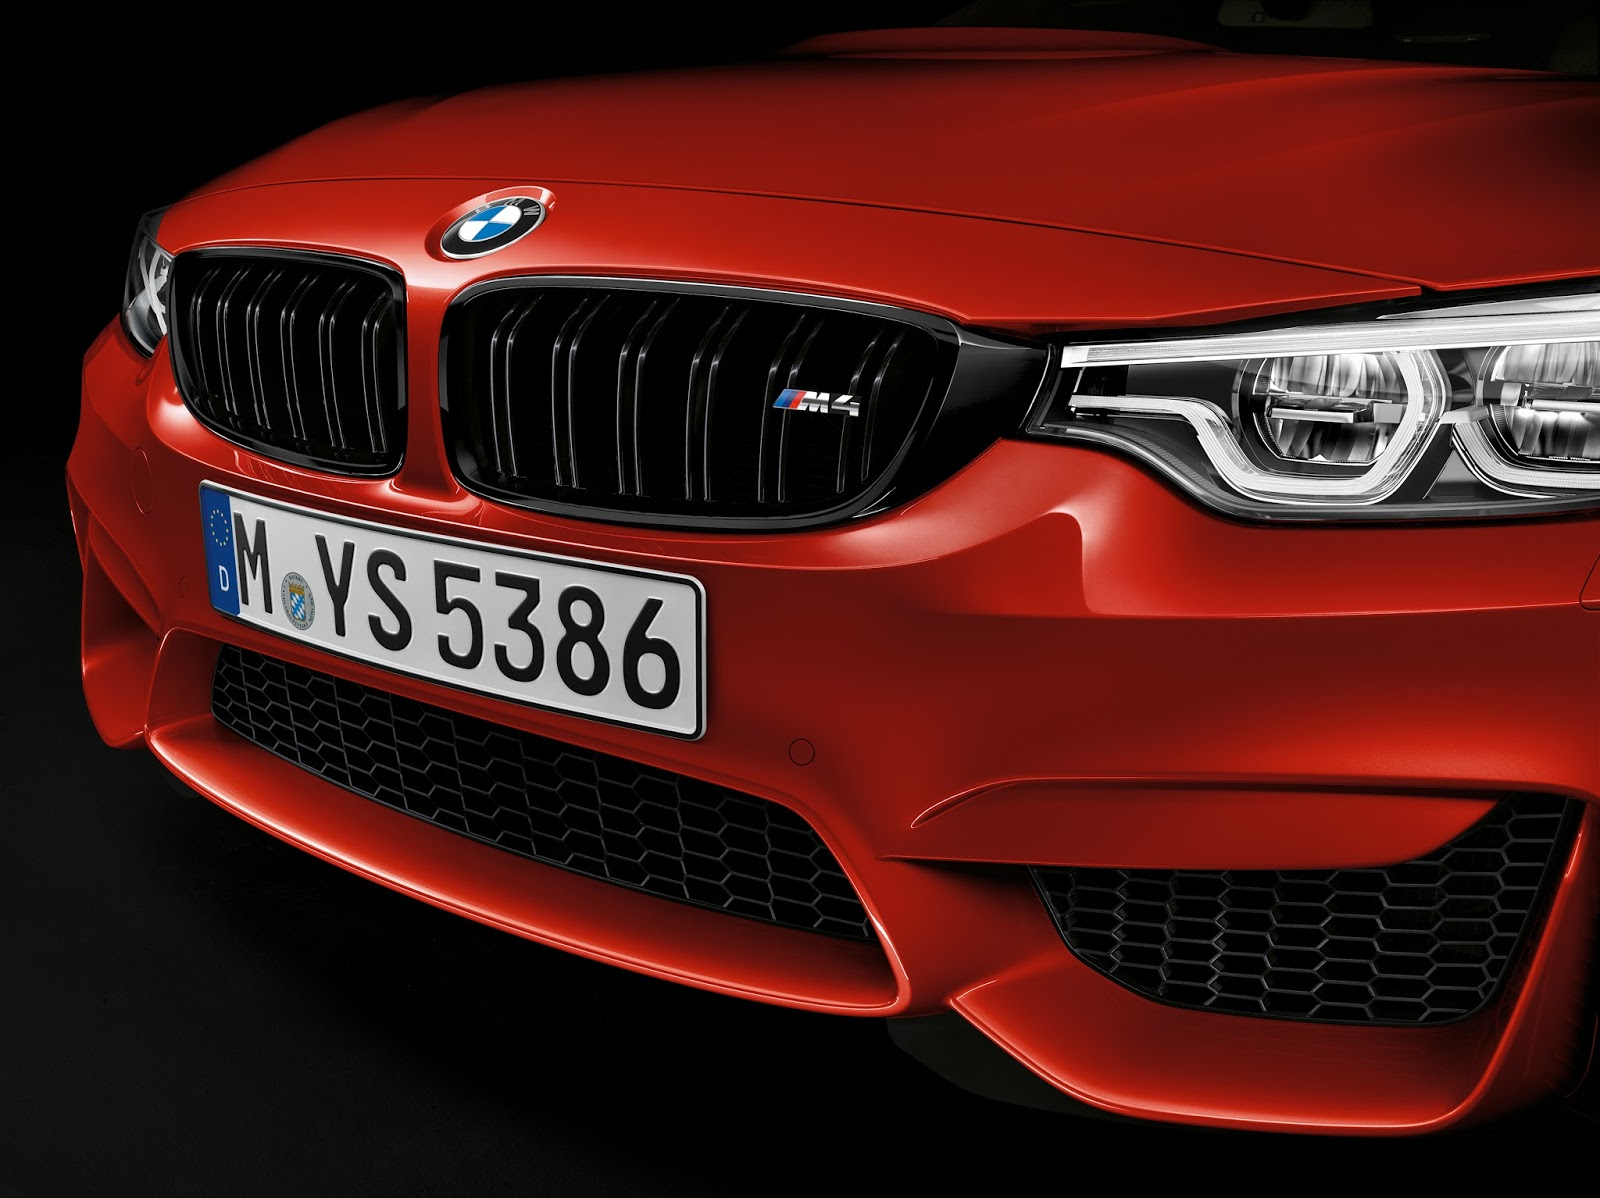 P90244959 highRes bmw m4 coup 01 2017 Η νέα BMW Σειρά 4, με πιο σφιχτή ρύθμιση ανάρτησης BMW, Bmw 4, BMW 4 Cabrio, BMW 4 Coupe, BMW 4 Gran Coupé, Facelift